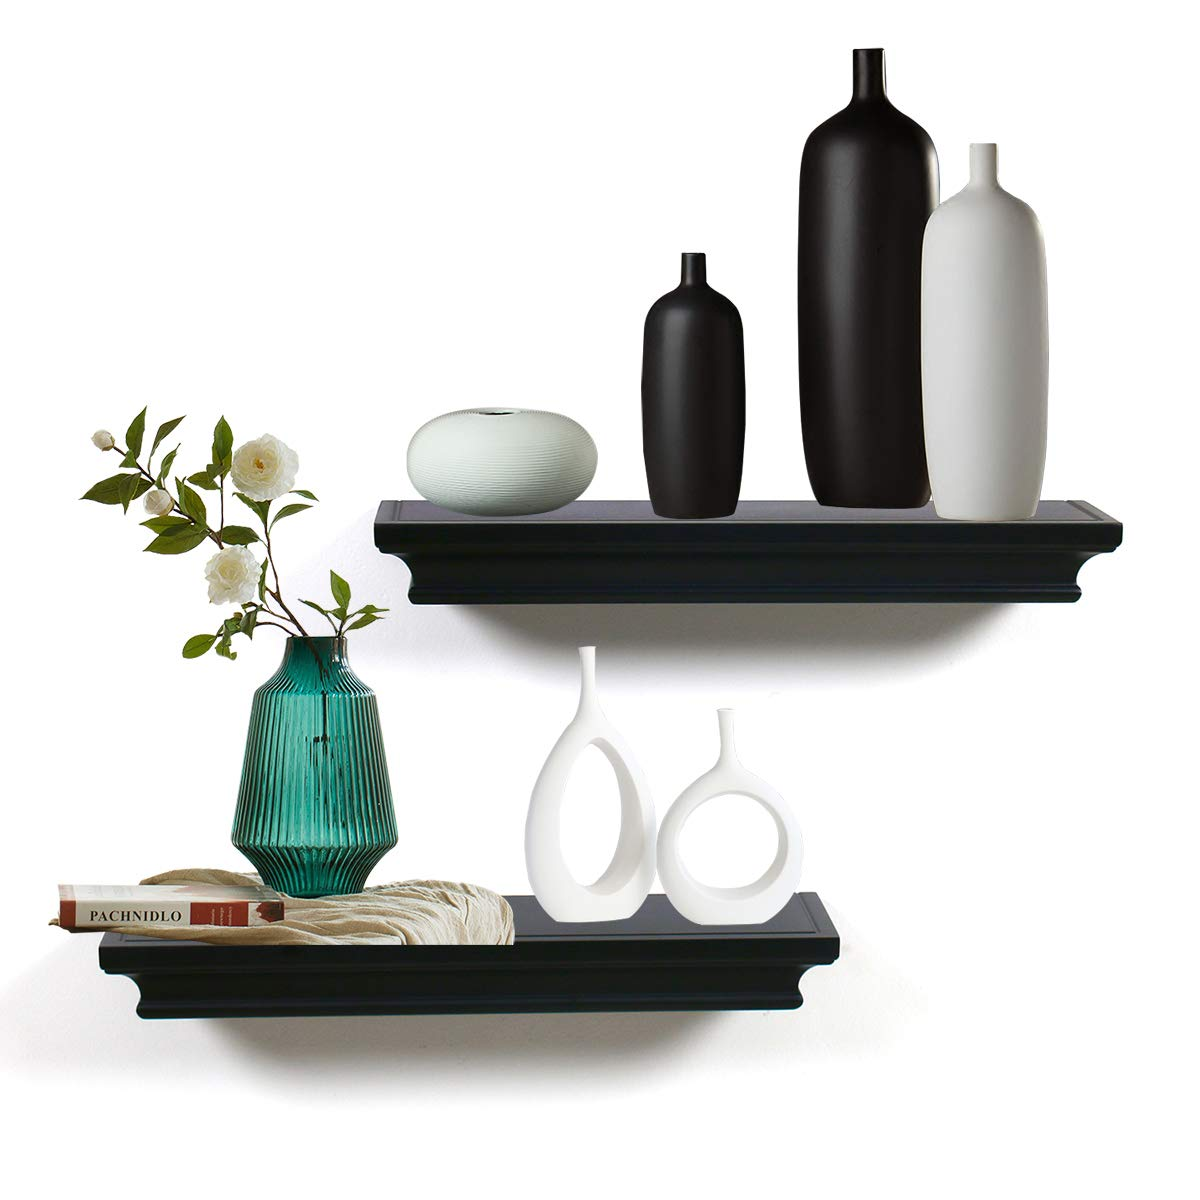 LightStan Floating Shelves Wall Mount, Modern Art Decorative Display Ledges for Living Room/Bedroom/Bathroom/Farmhouse - 4 Inches Deep Storage, Set of 2, Black